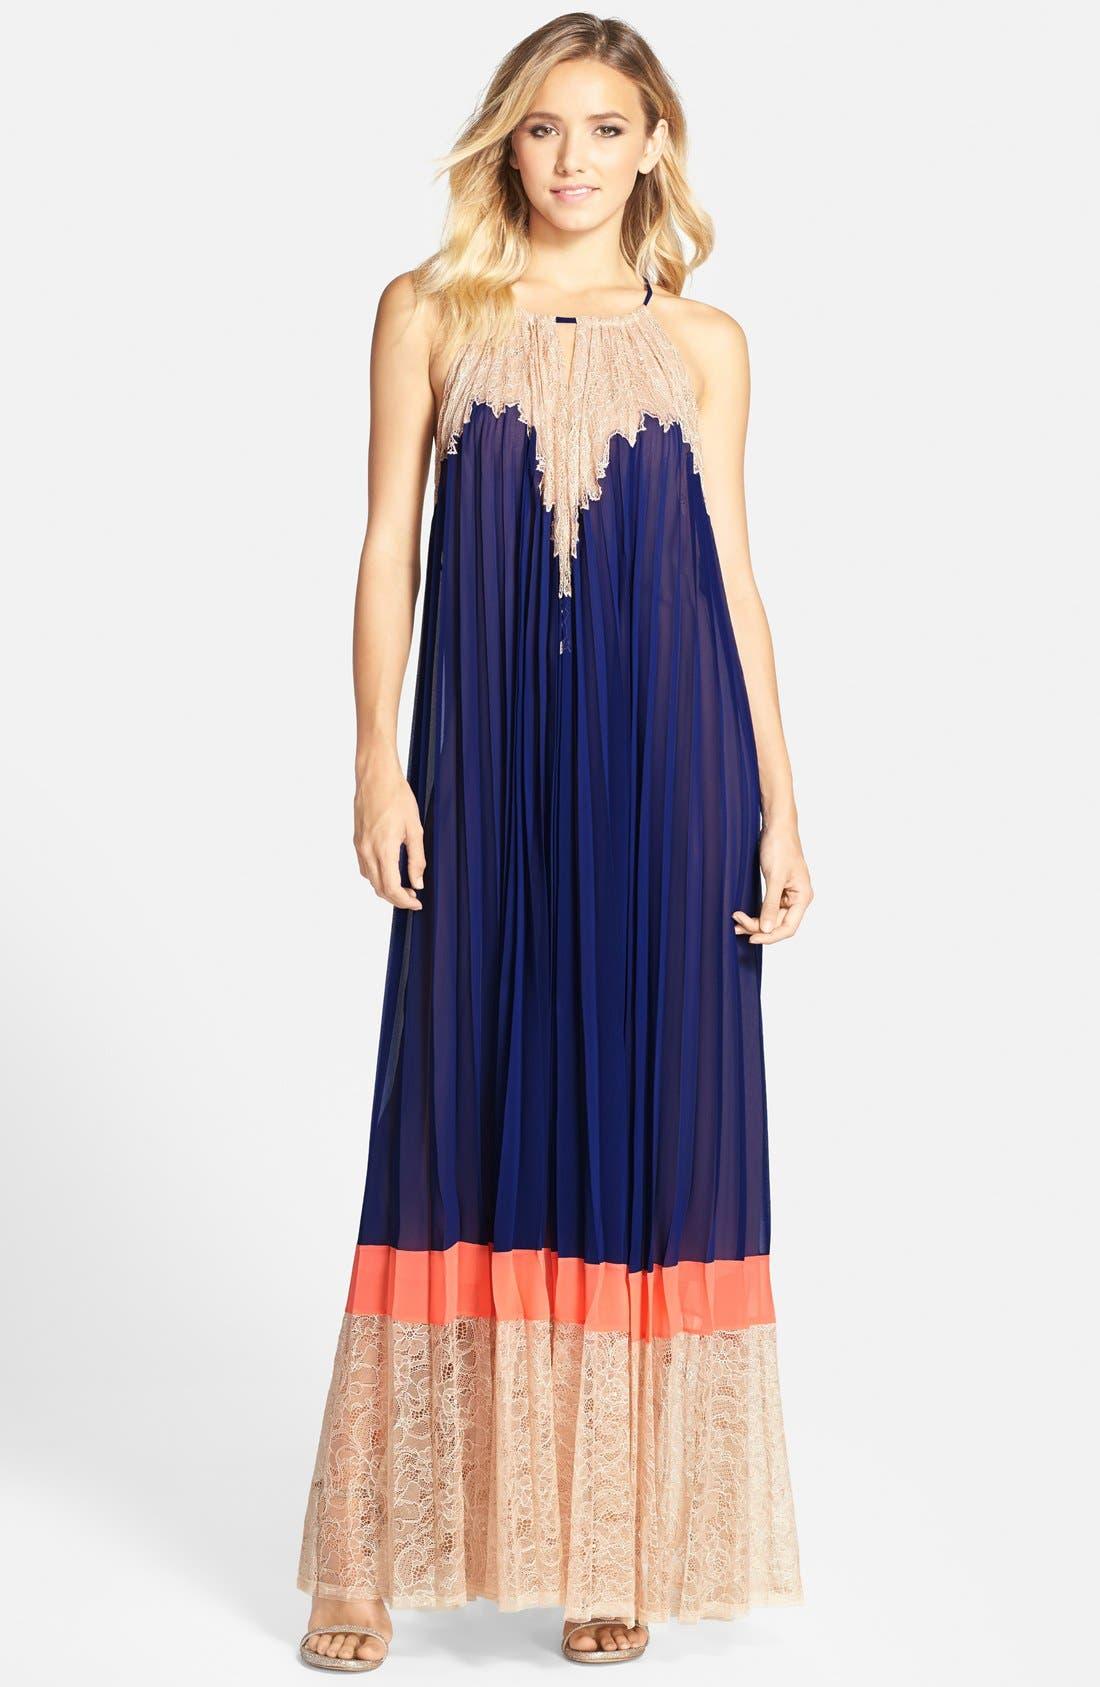 Alternate Image 1 Selected - BCBGMAXAZRIA 'Brieena' Colorblock Sleeveless Maxi Dress